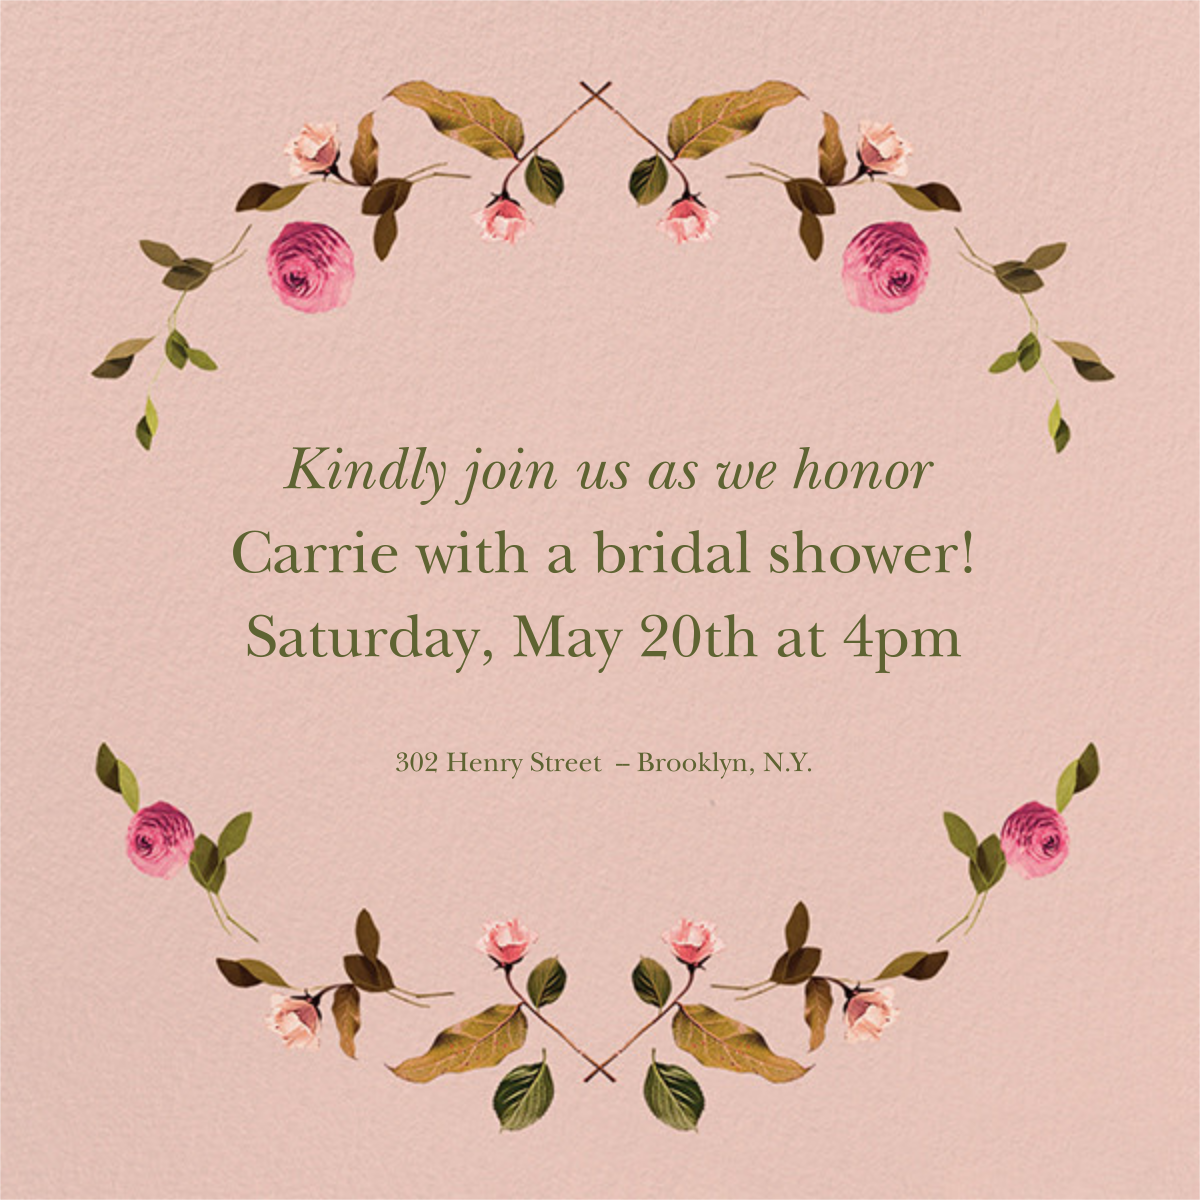 Cortile (Square) - Venamour - Bridal shower